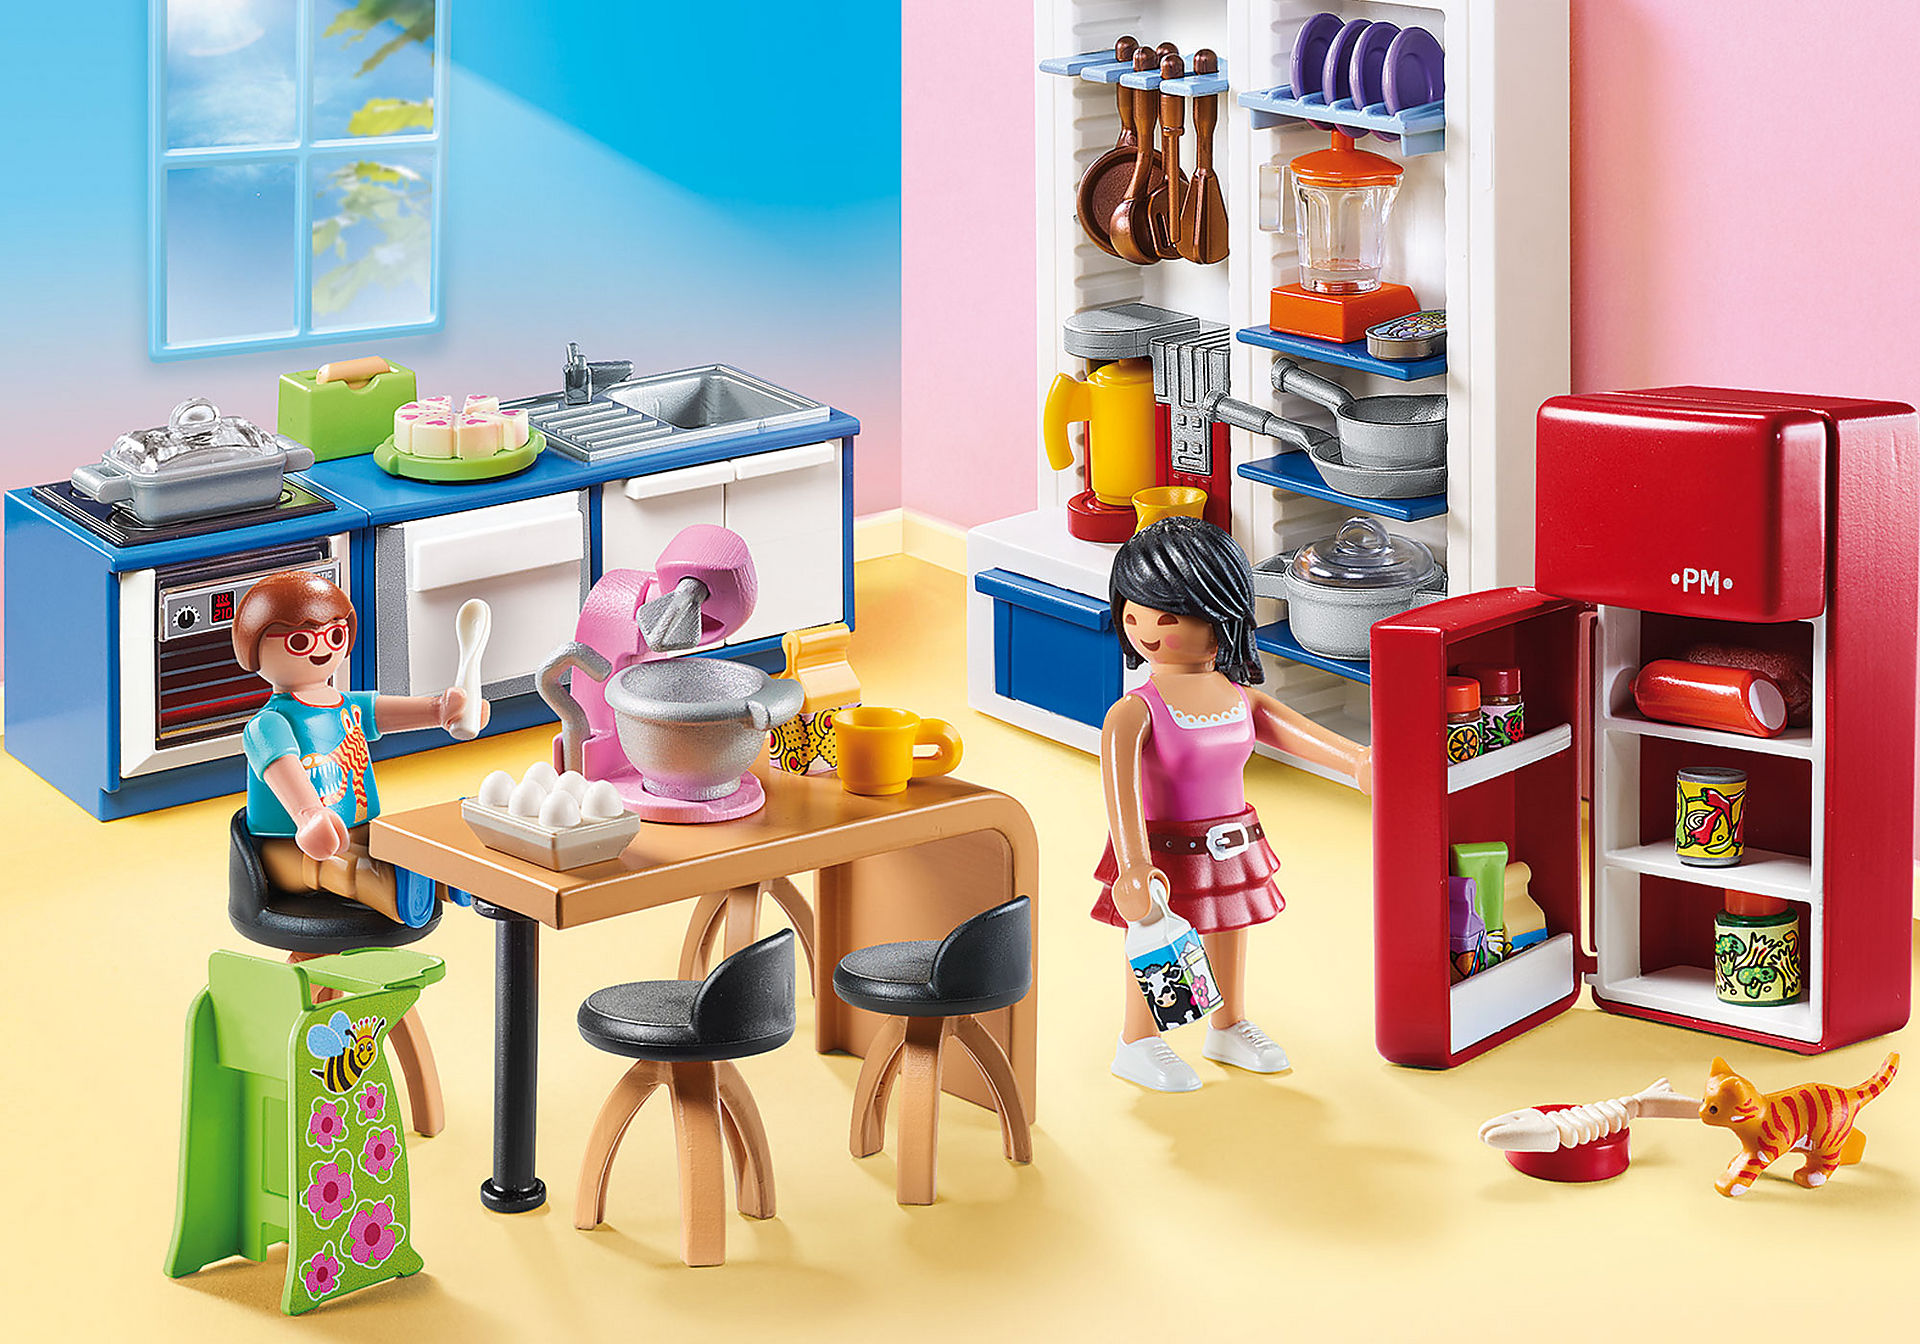 70206 Family Kitchen zoom image1